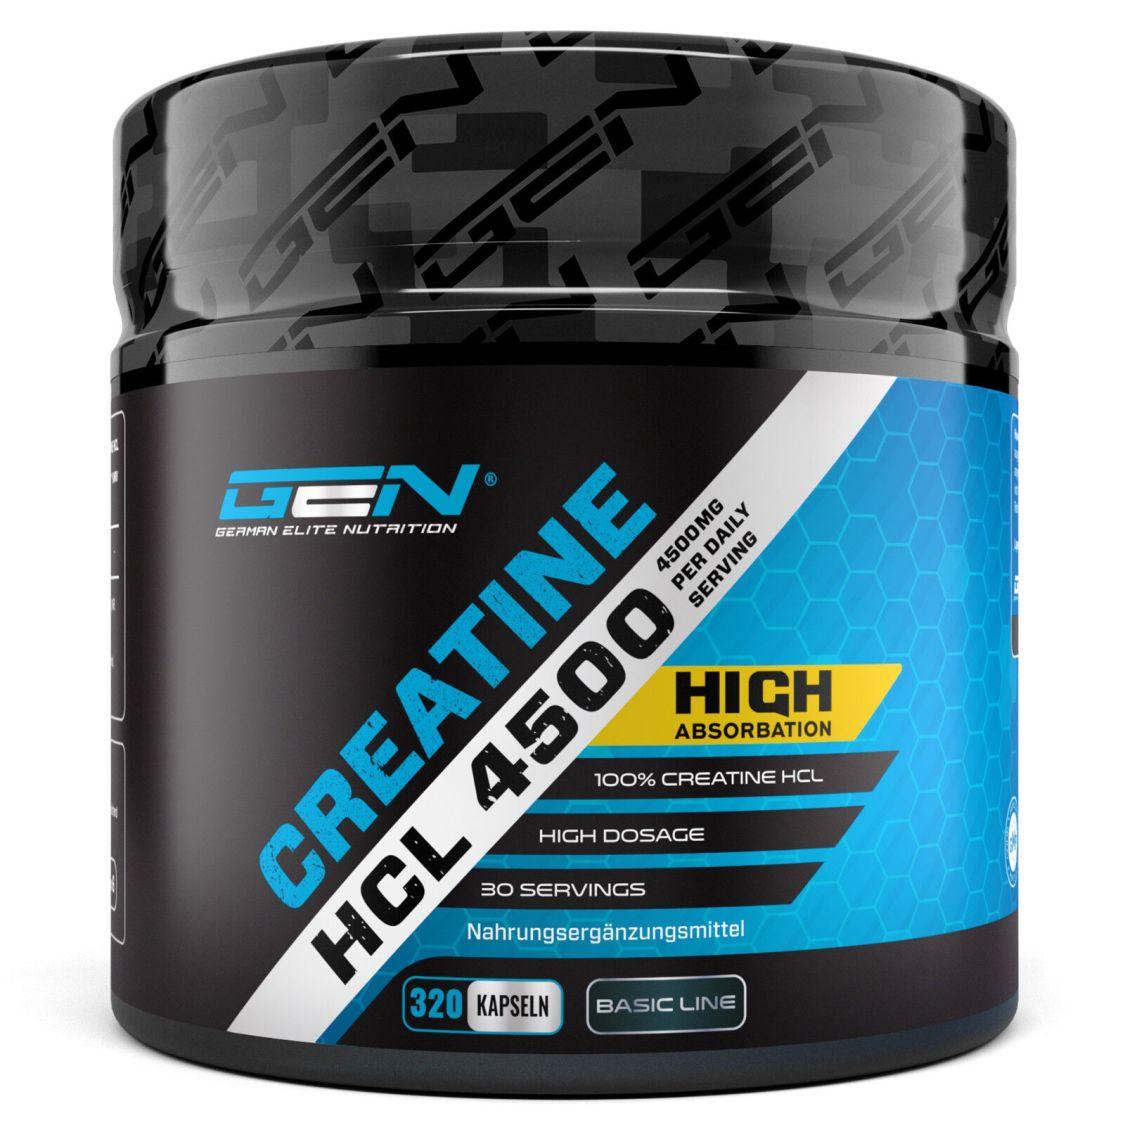 320 Kapseln Creatin HCL 4500 MG  No Creatine Monohydrat Kreatin Muskelaufbau